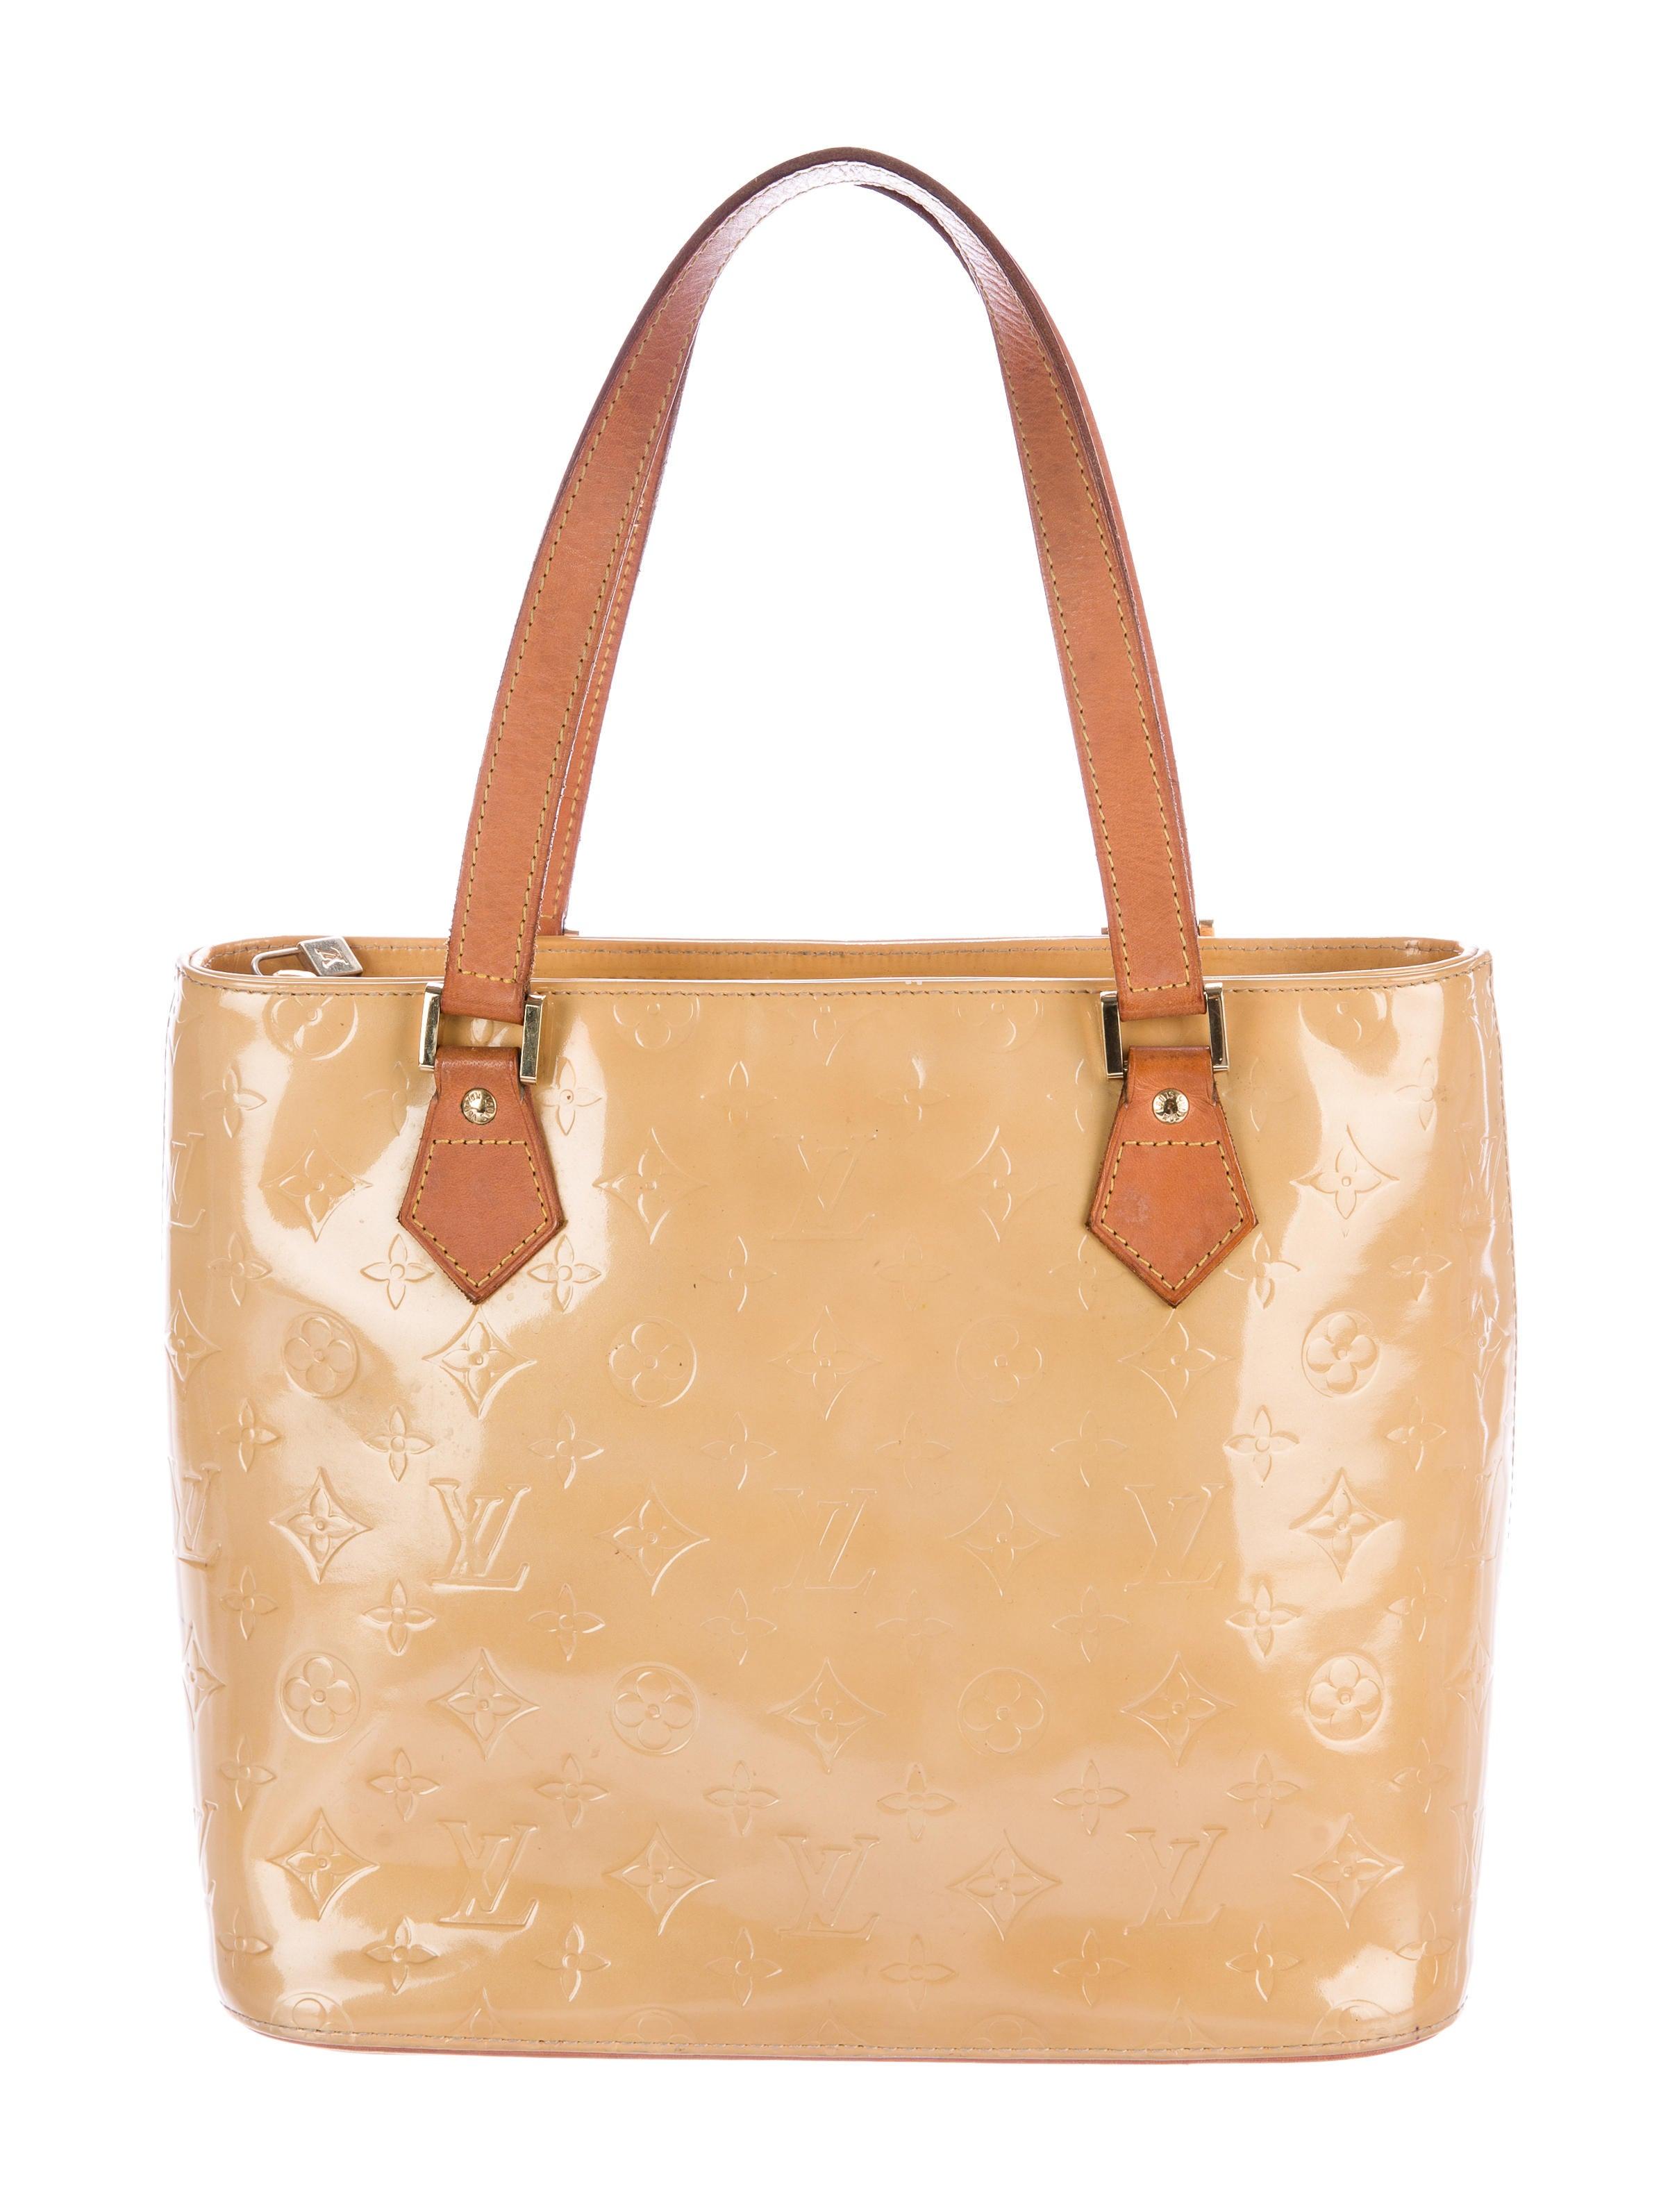 2222e8283647c Buy Louis Vuitton Purse Houston Texas